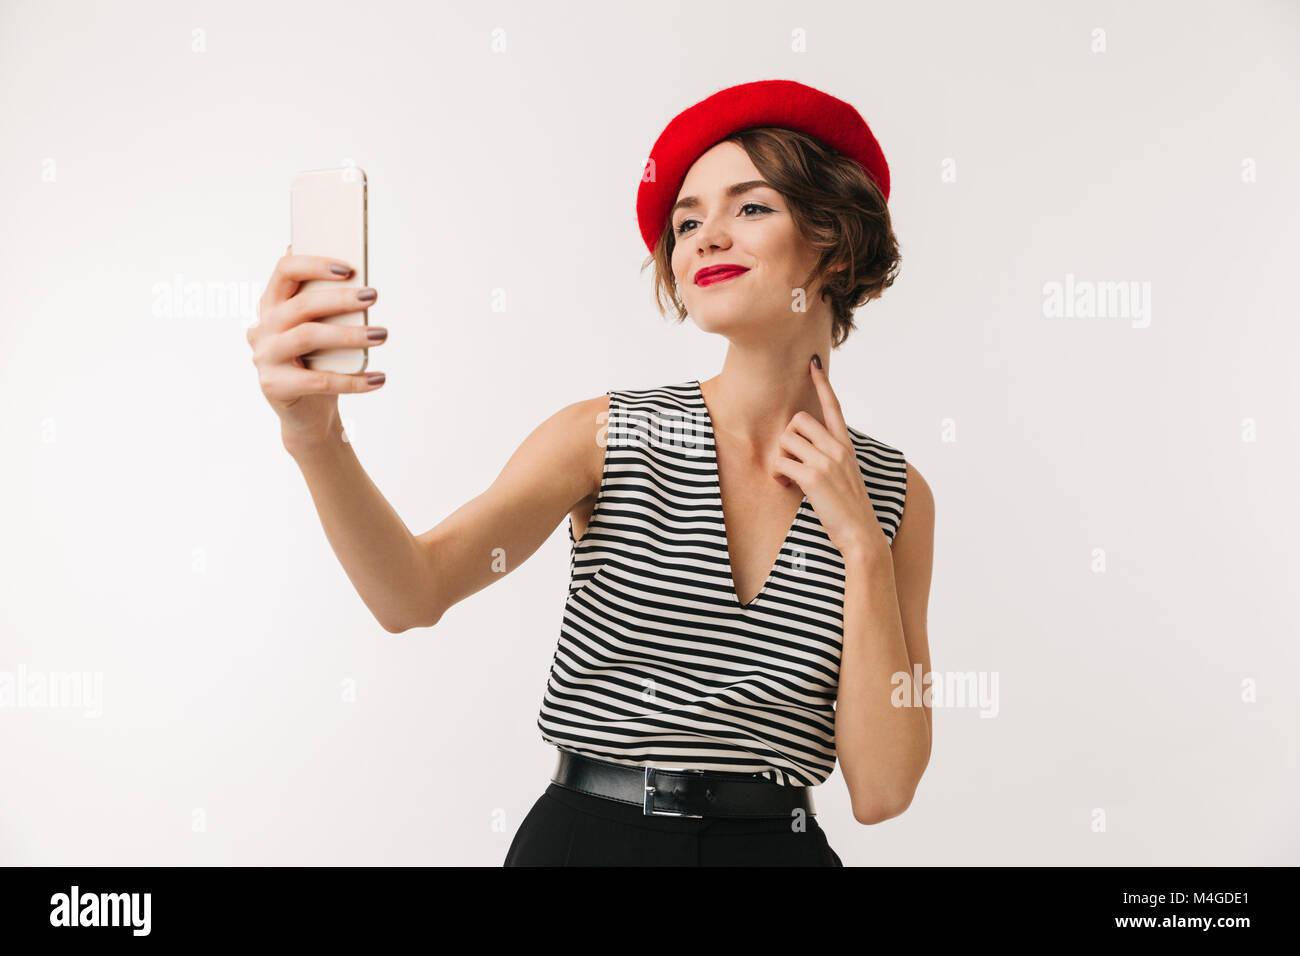 Selfie Xamira Zuloaga nude (84 photos), Ass, Paparazzi, Selfie, underwear 2017